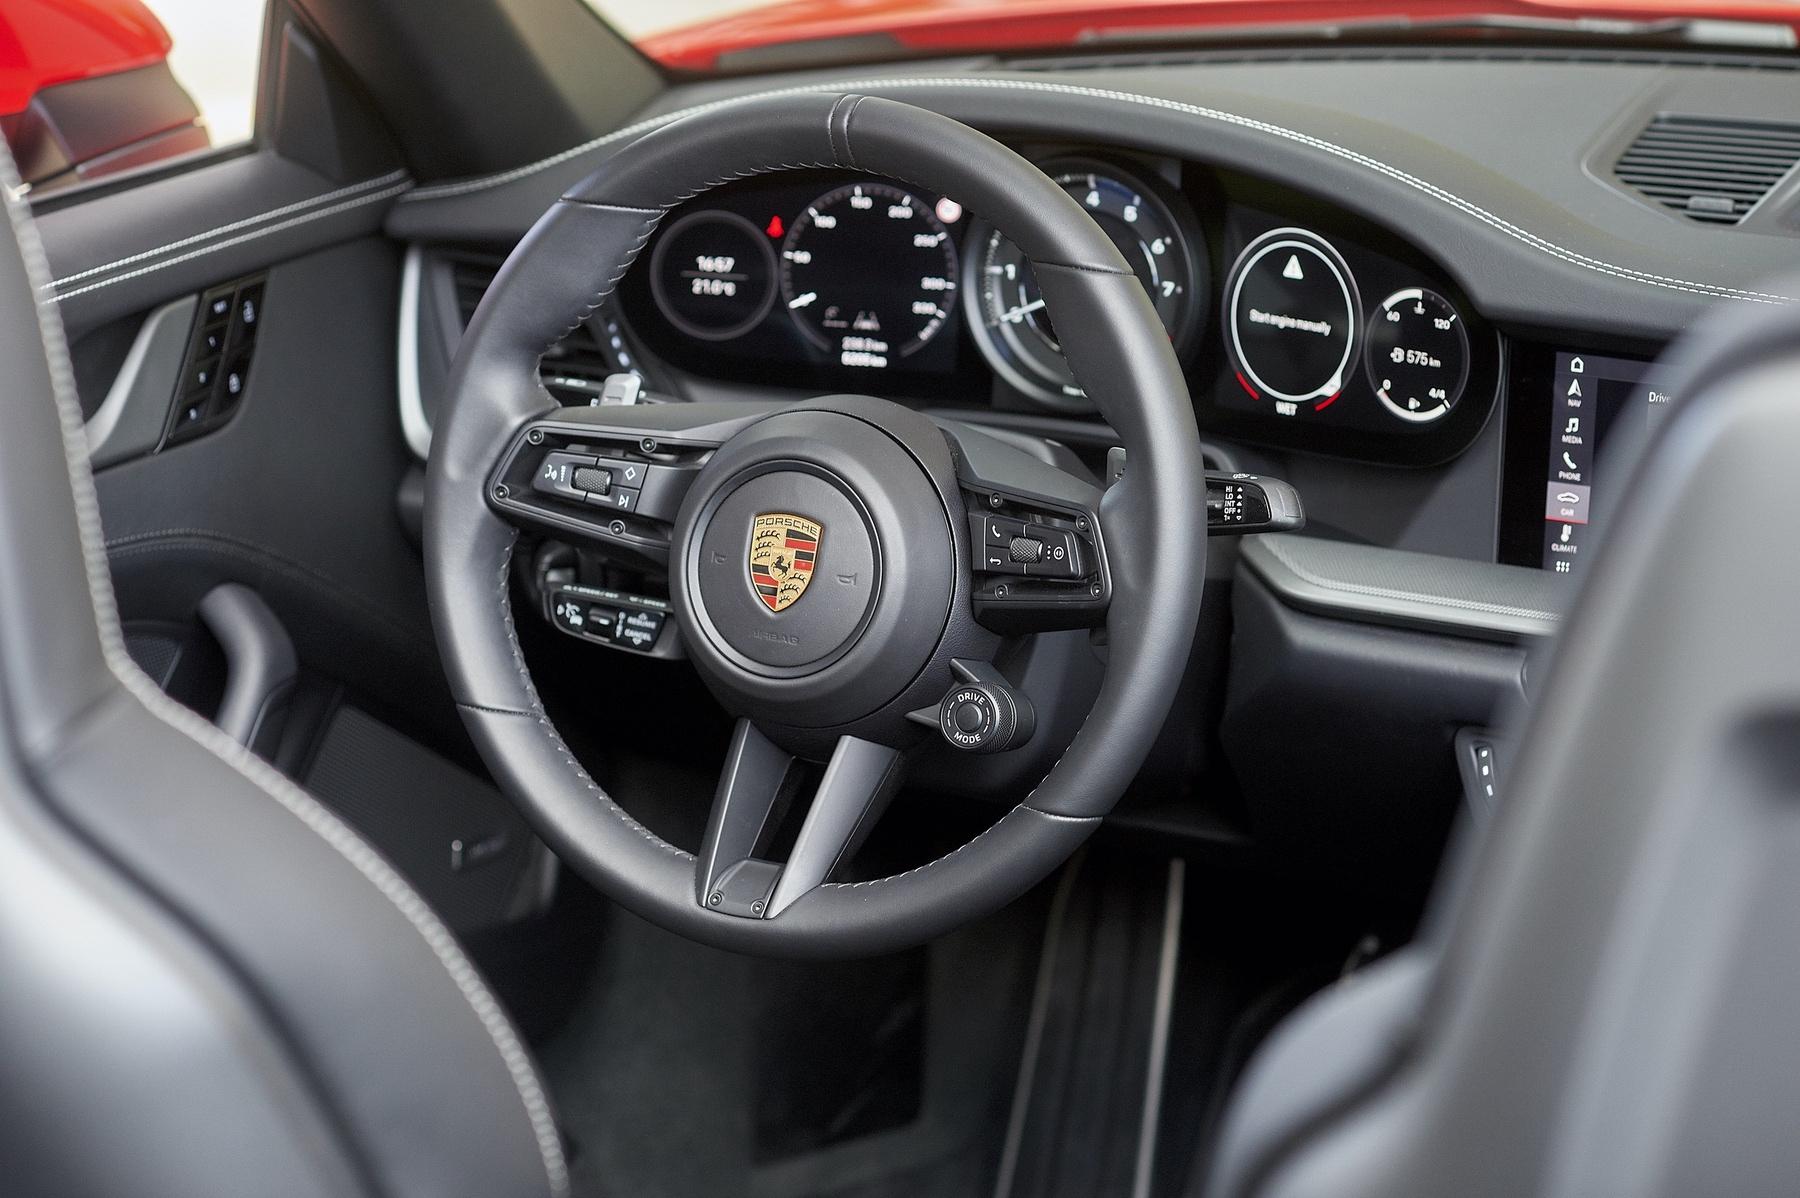 Test_Drive_Porsche_911_Athens_0156